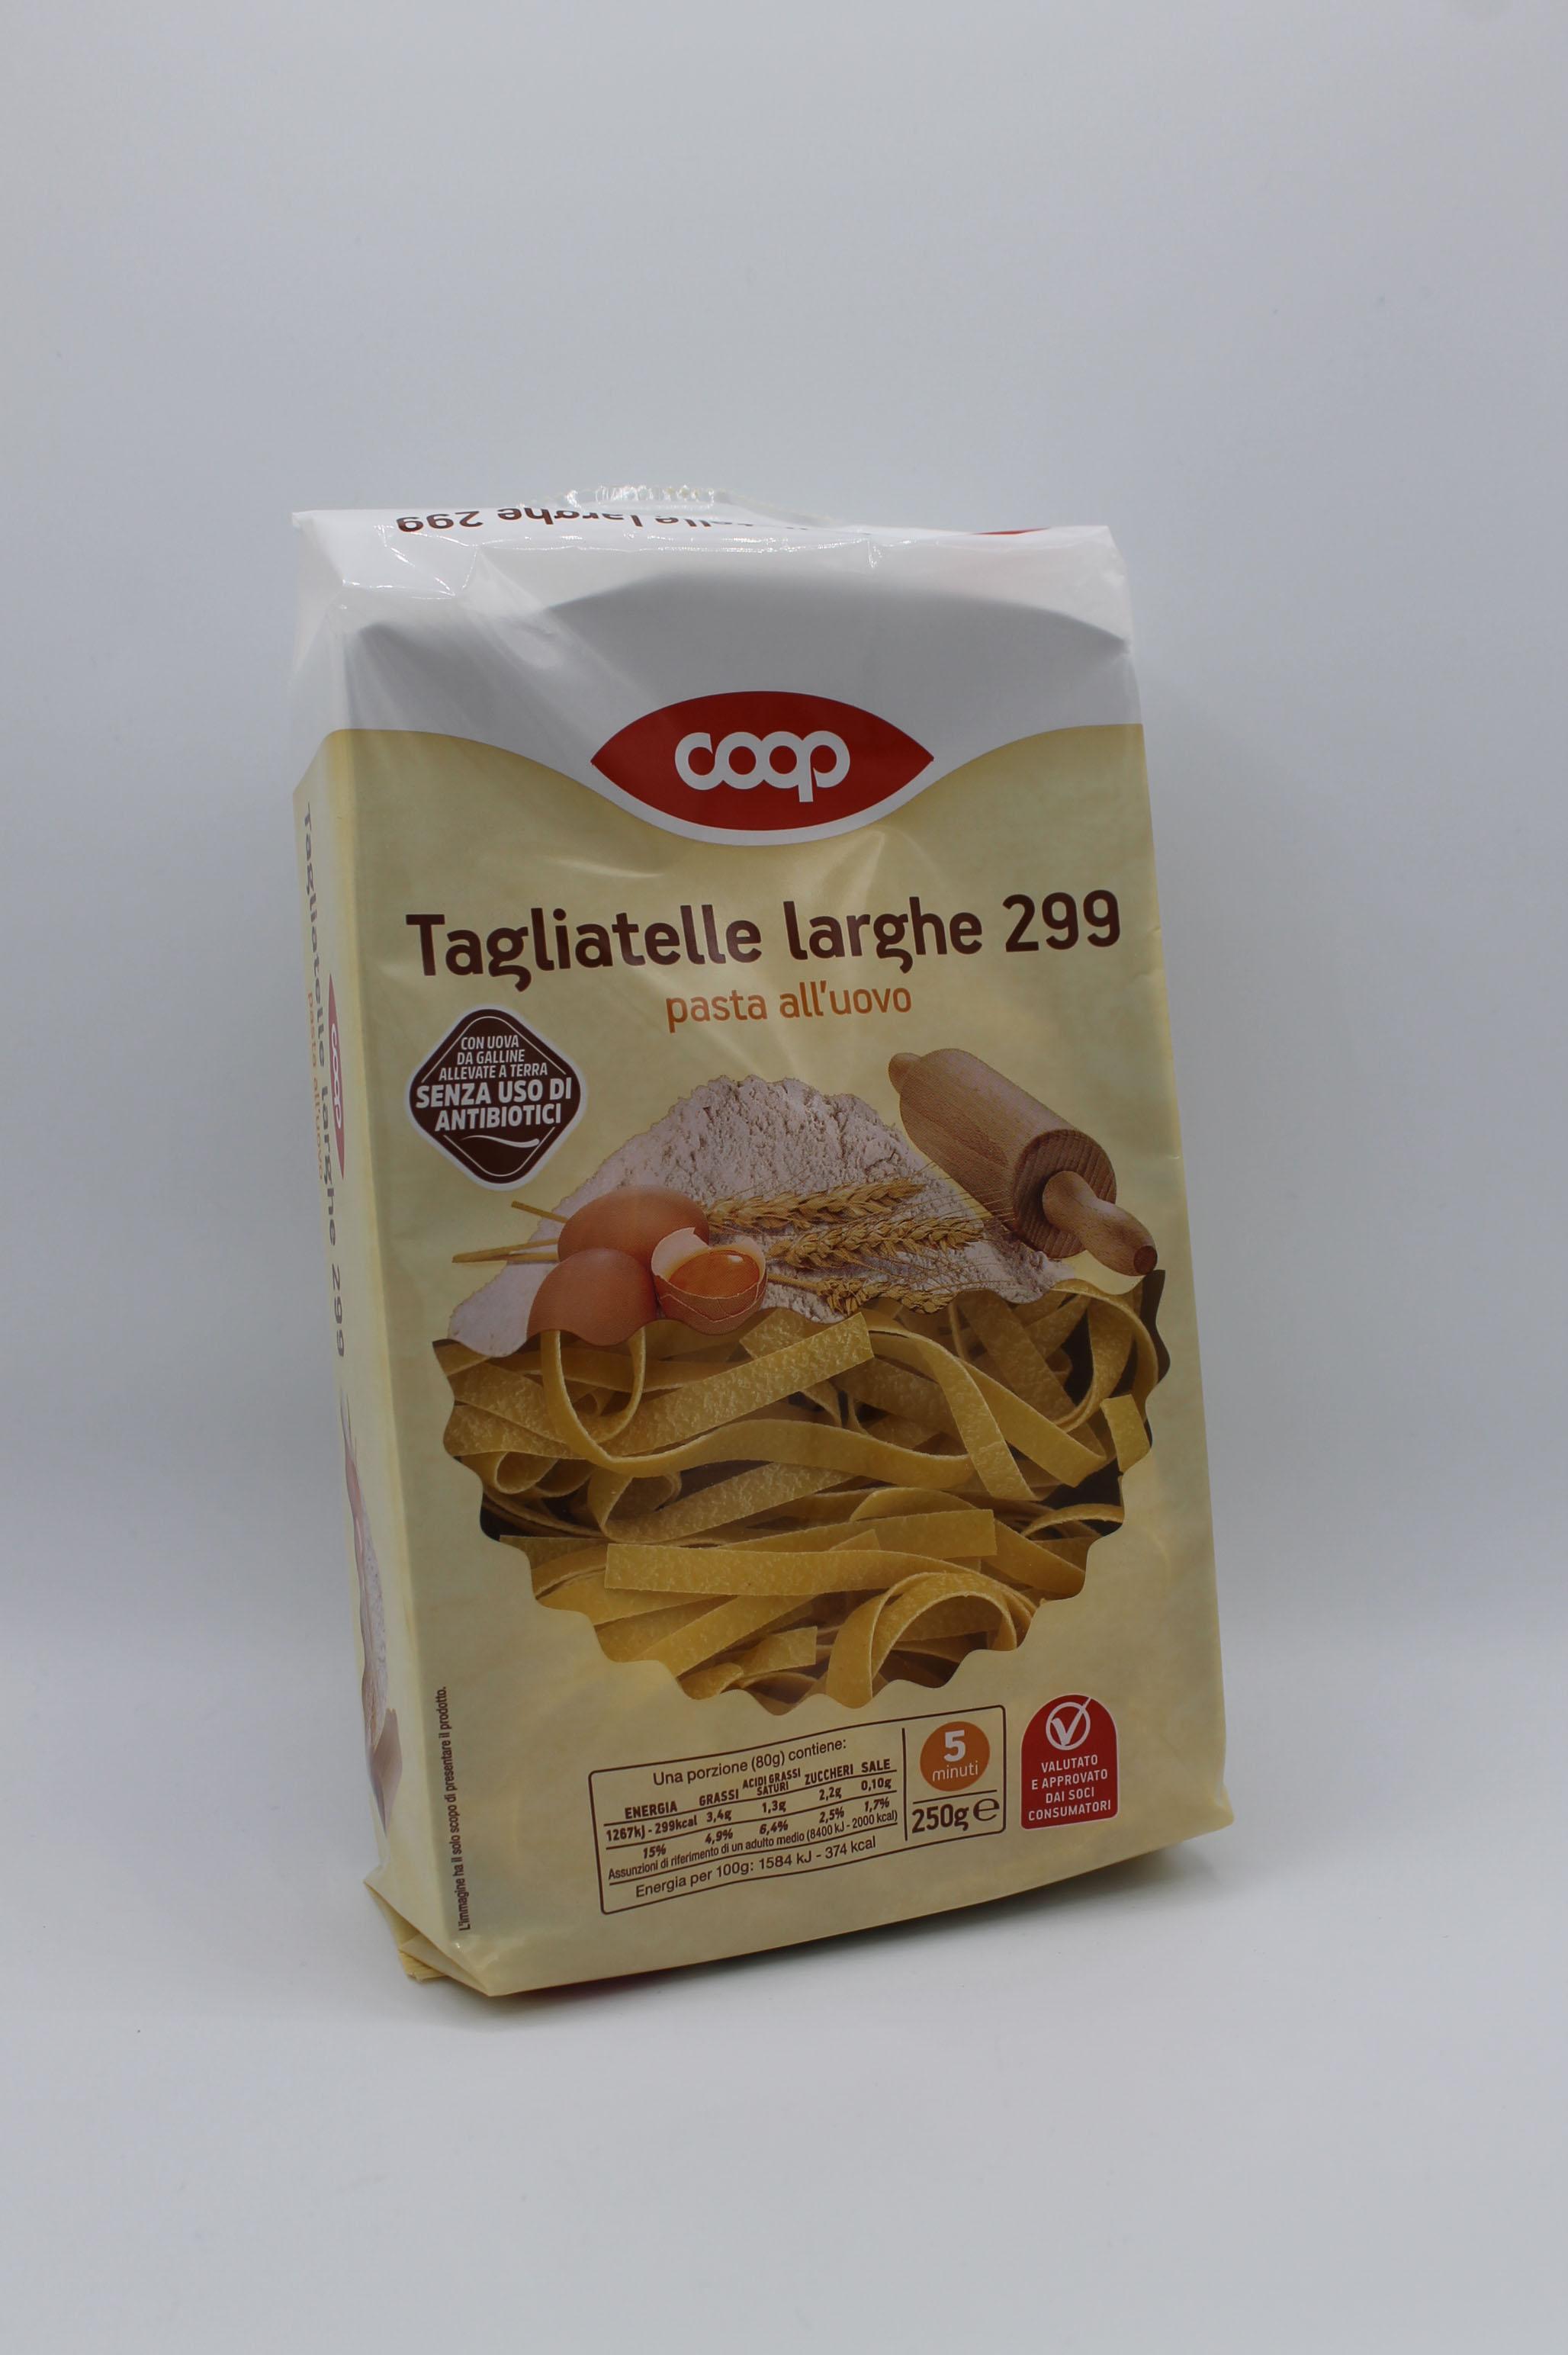 Coop tagliatelle larghe uovo 250gr.